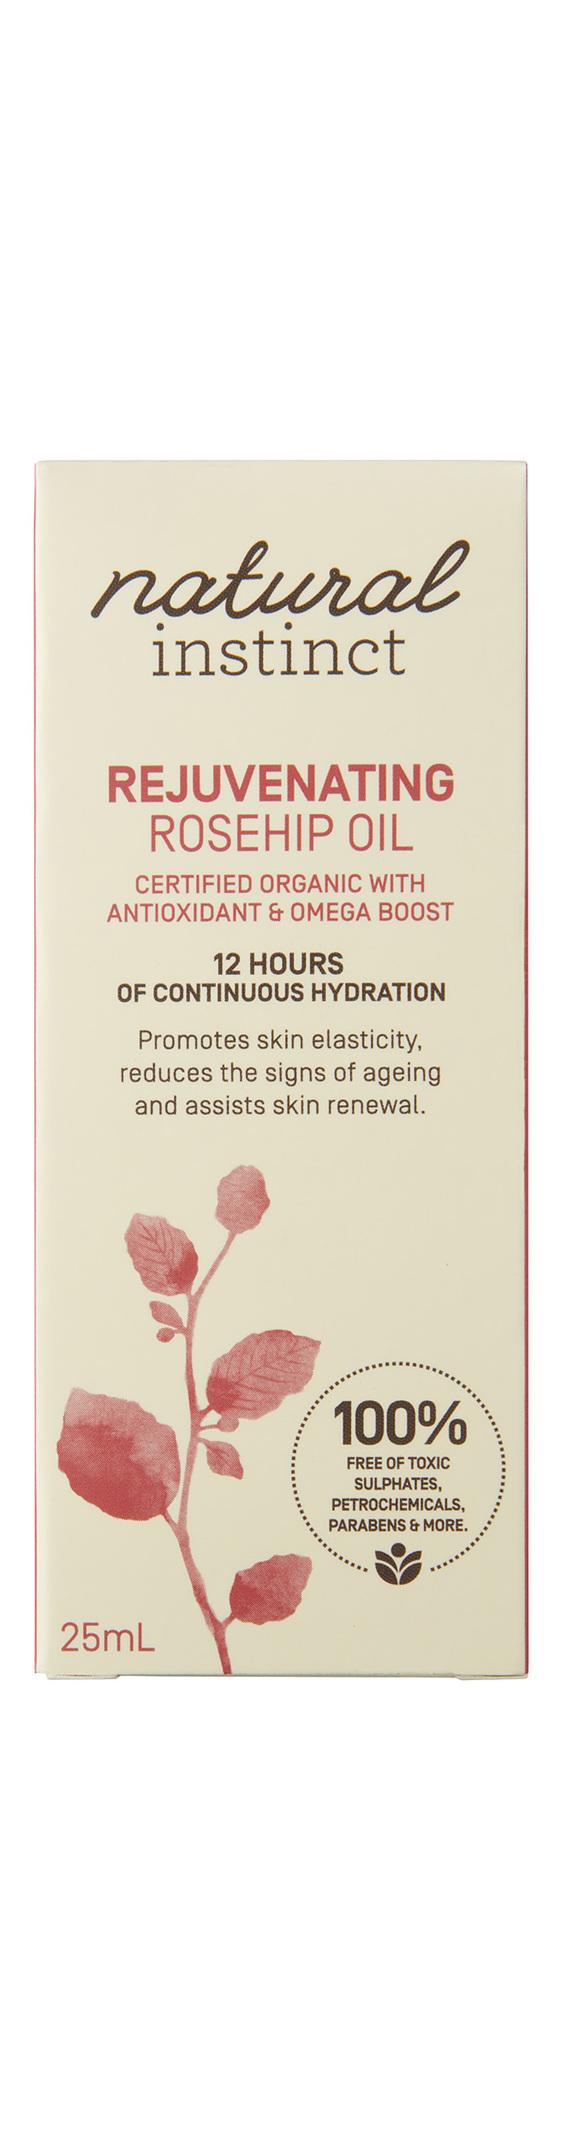 Natural Instinct Rejuvenating Rosehip Oil 25ml